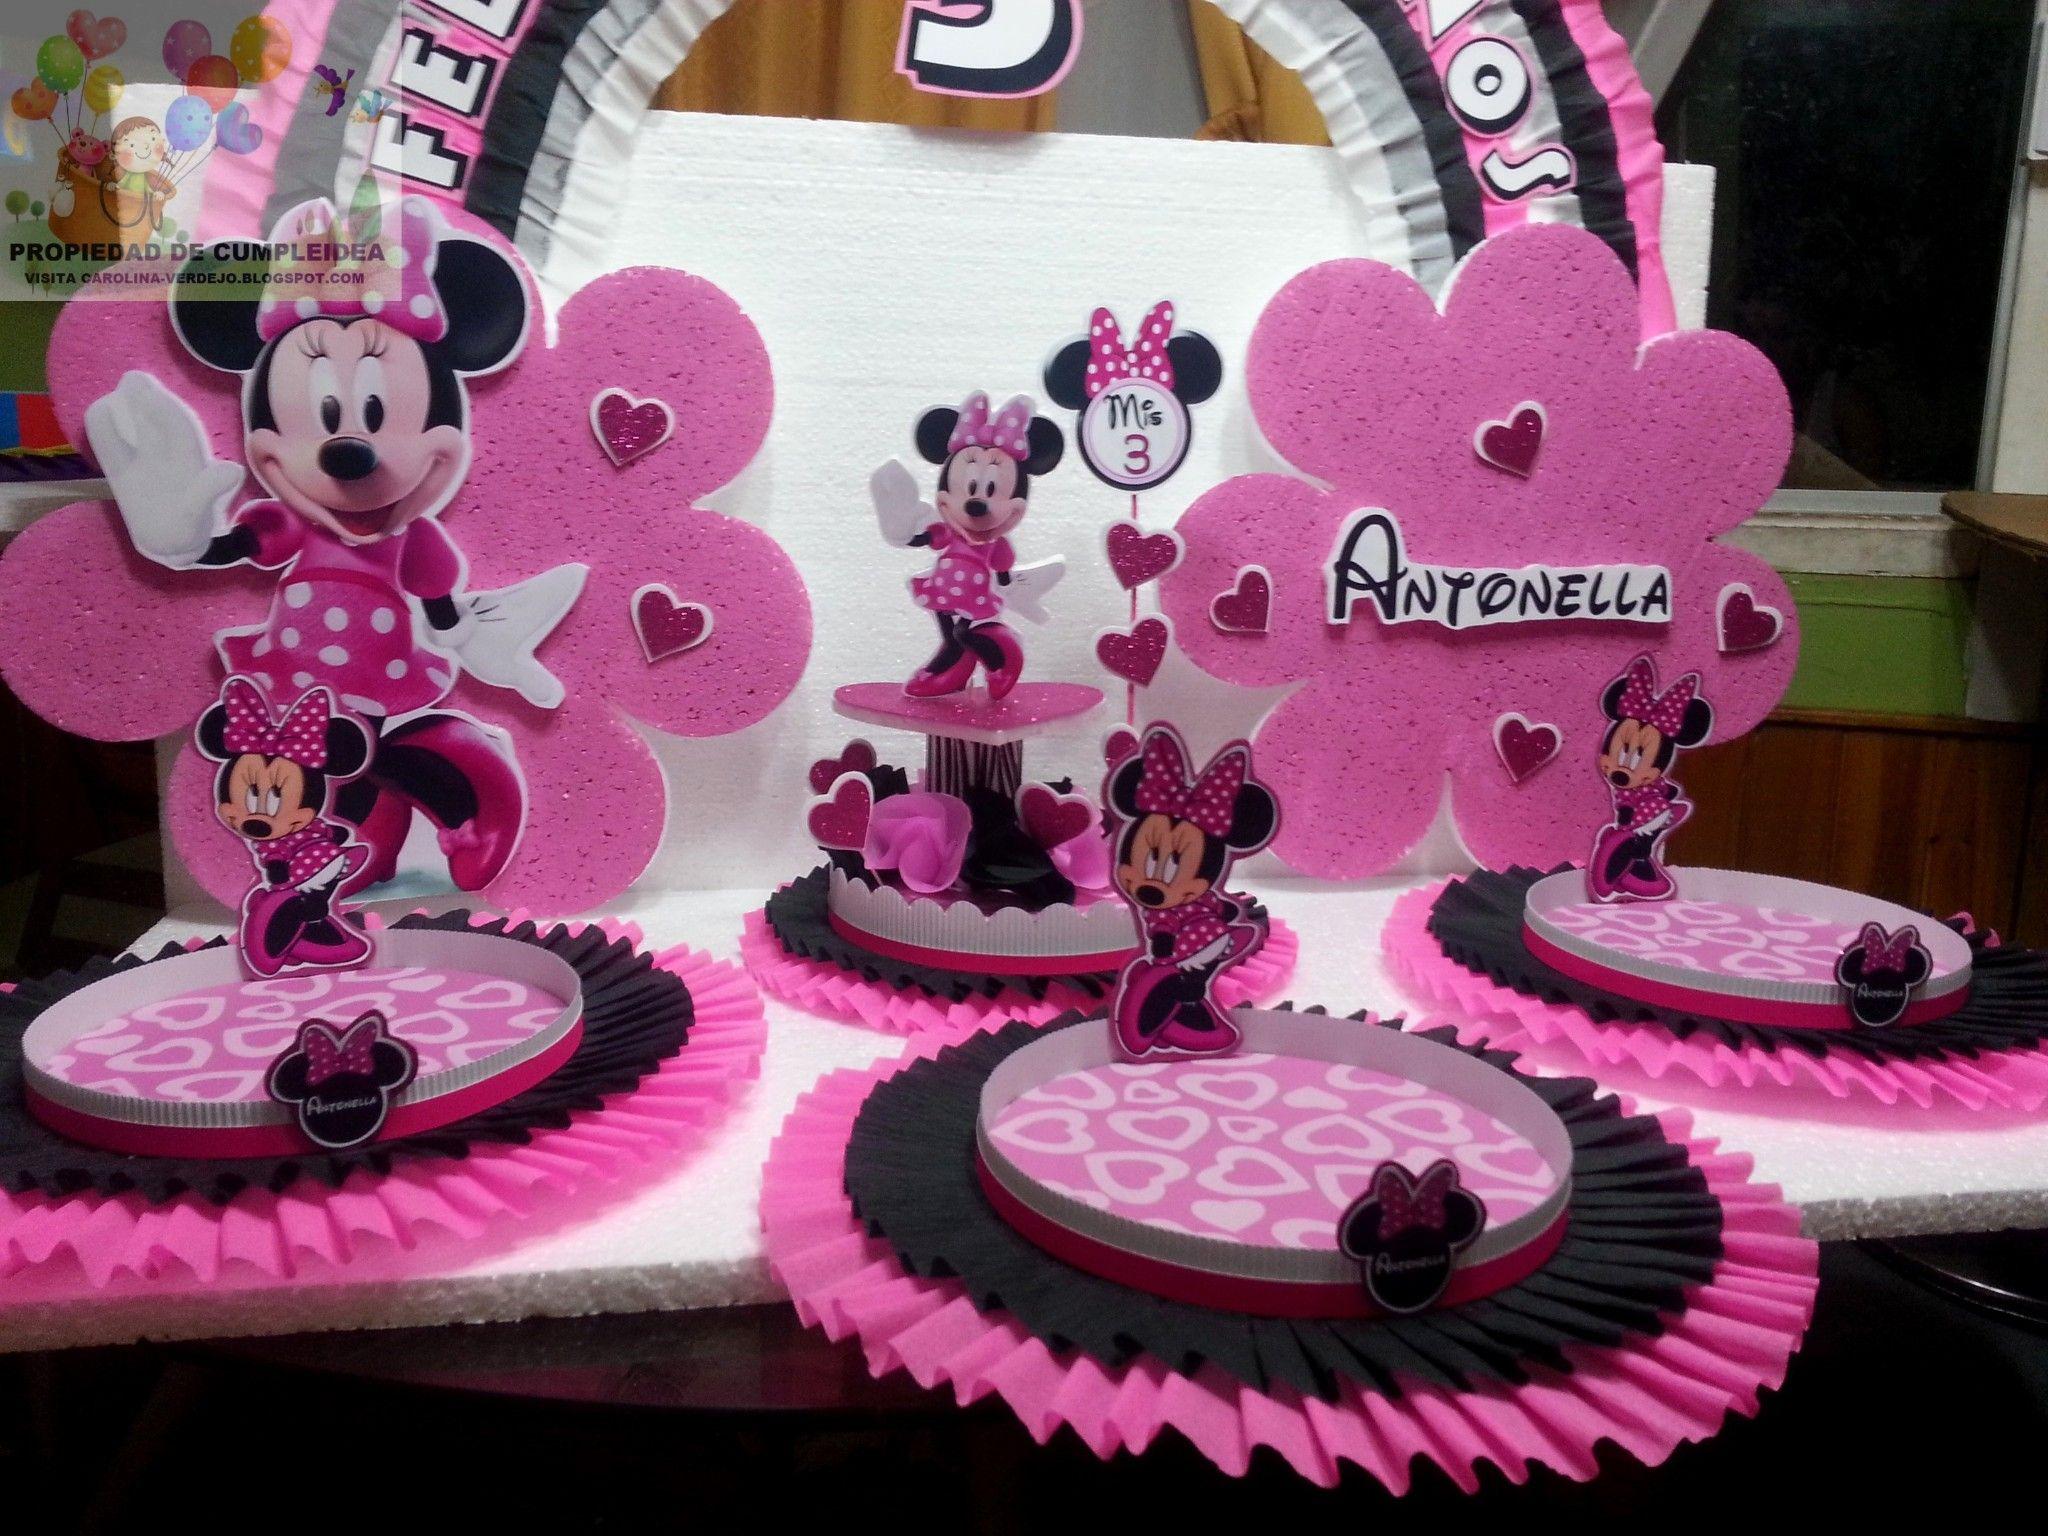 Decoracion de fiestas infantiles minnie mouse 1 minnie - Bandejas decoracion salon ...